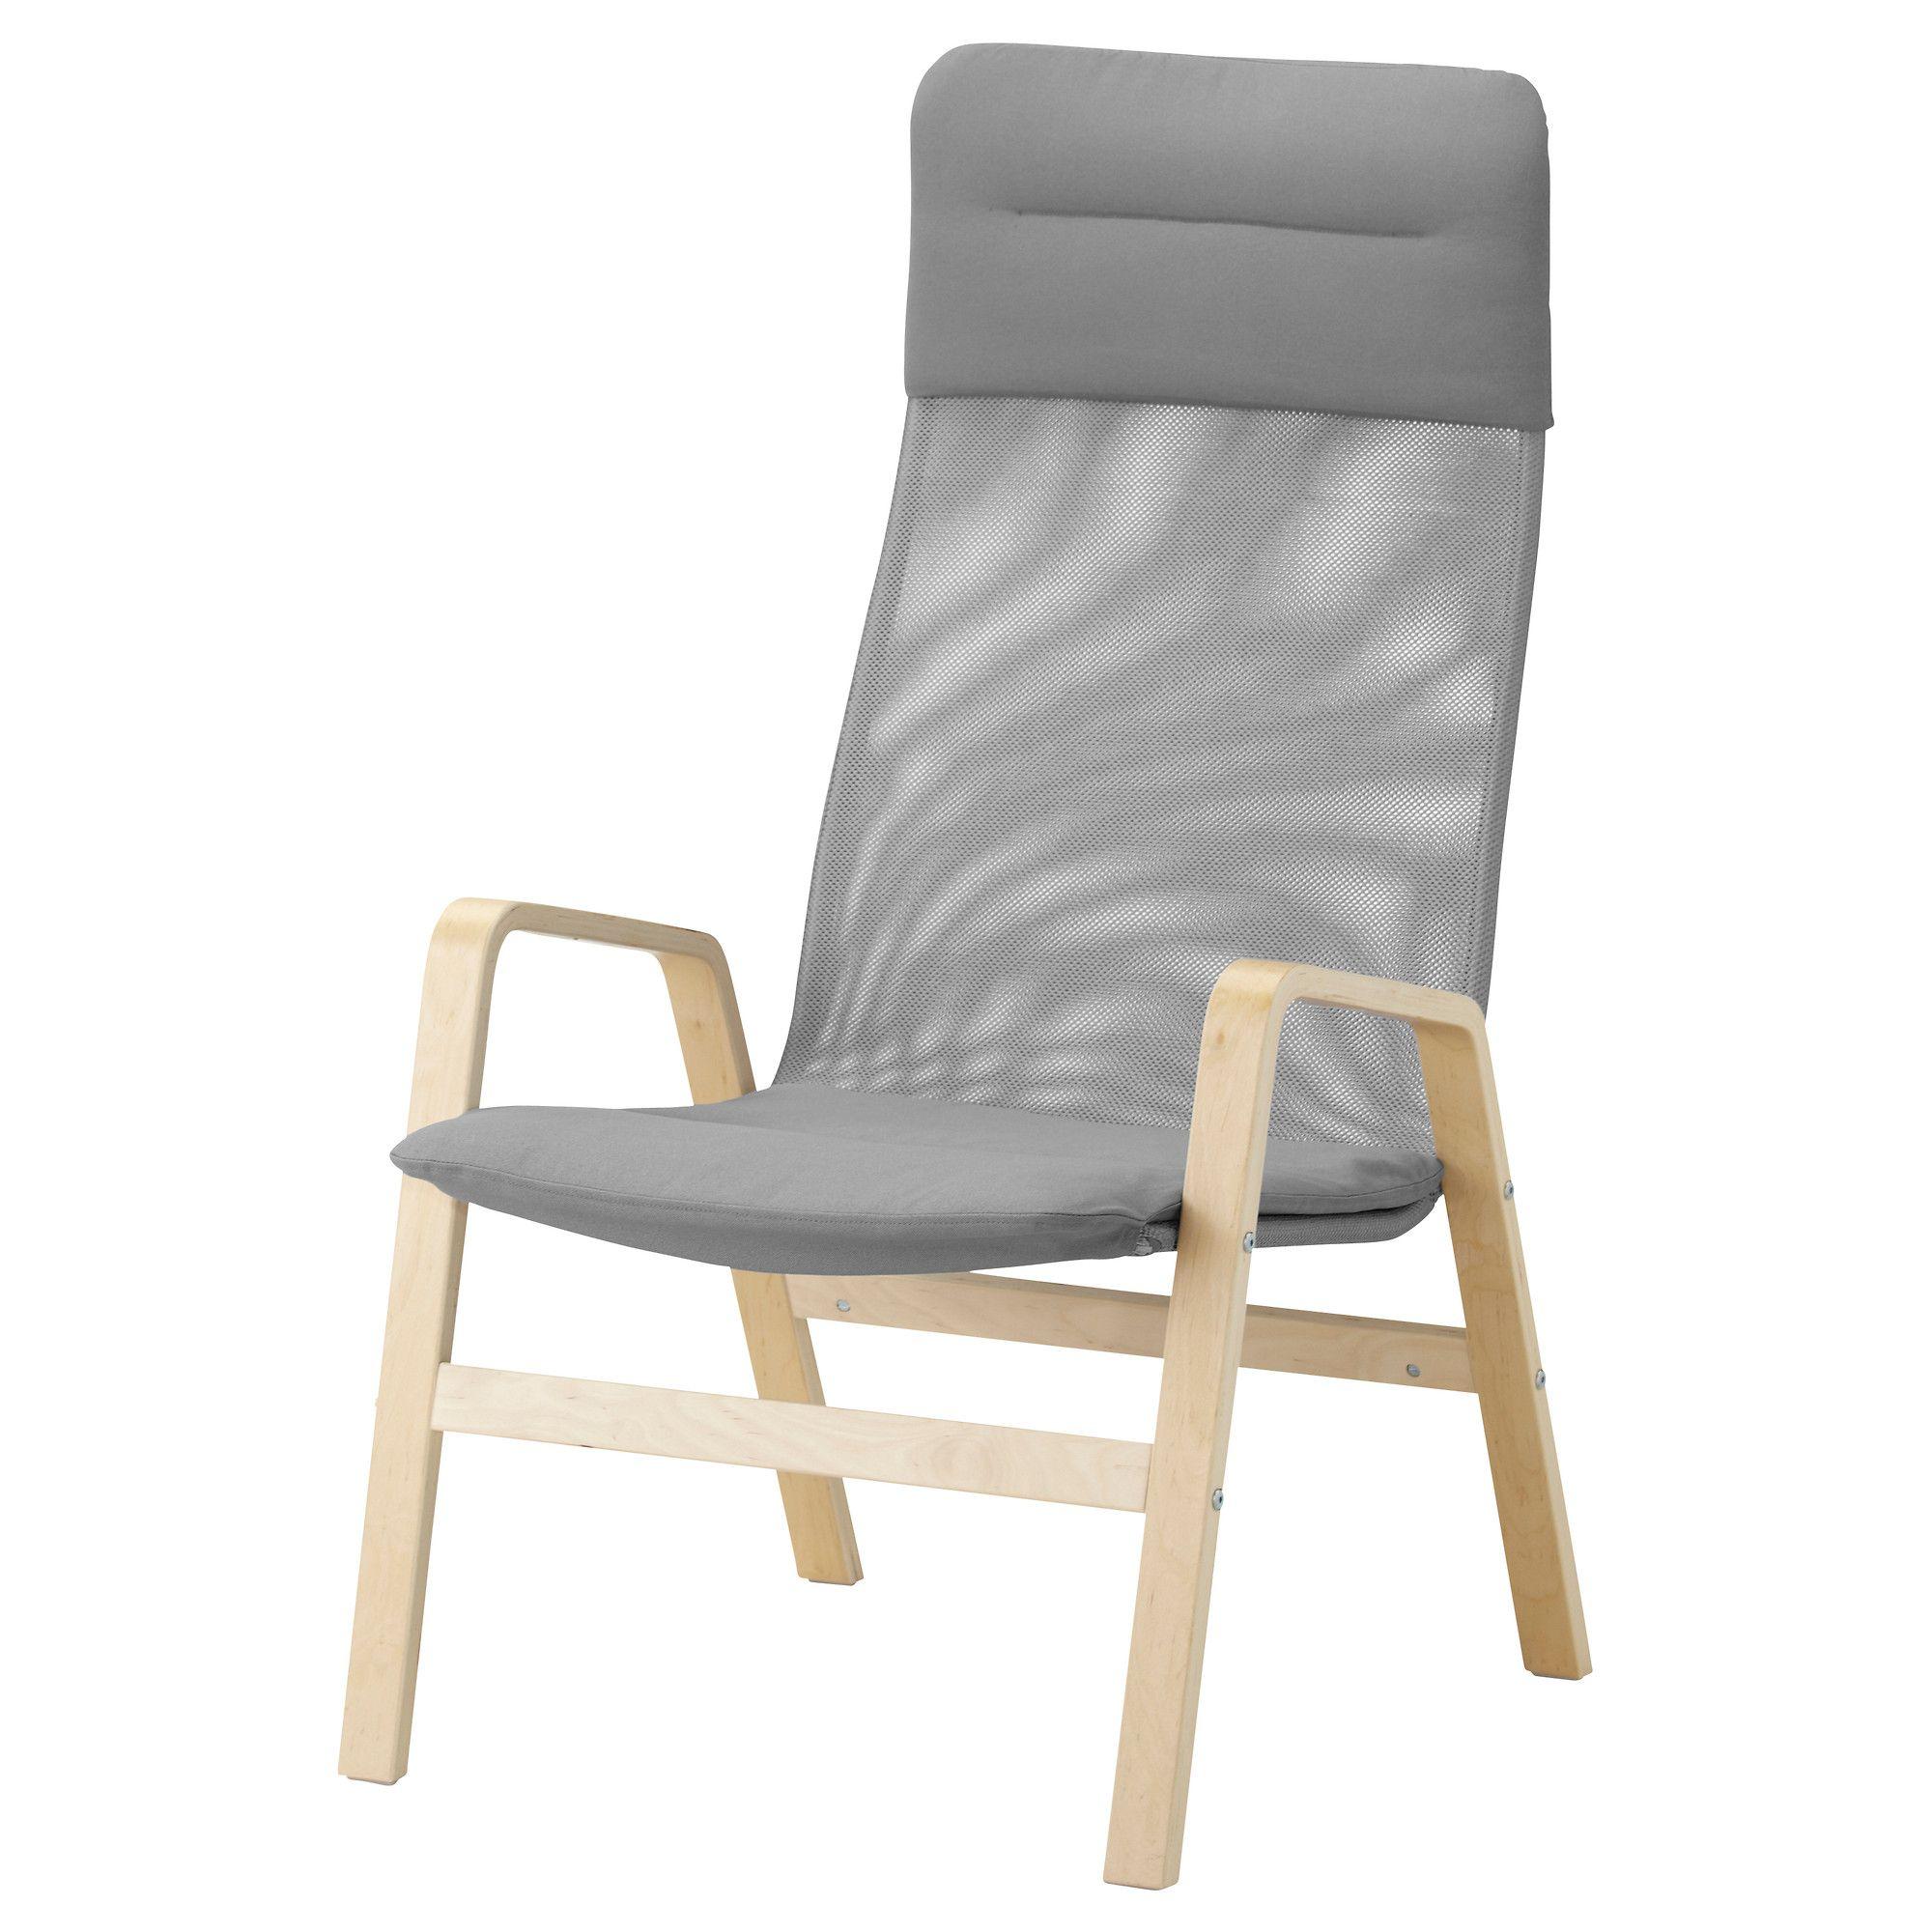 nolbyn chair high birch veneer gray ikeamachine washable